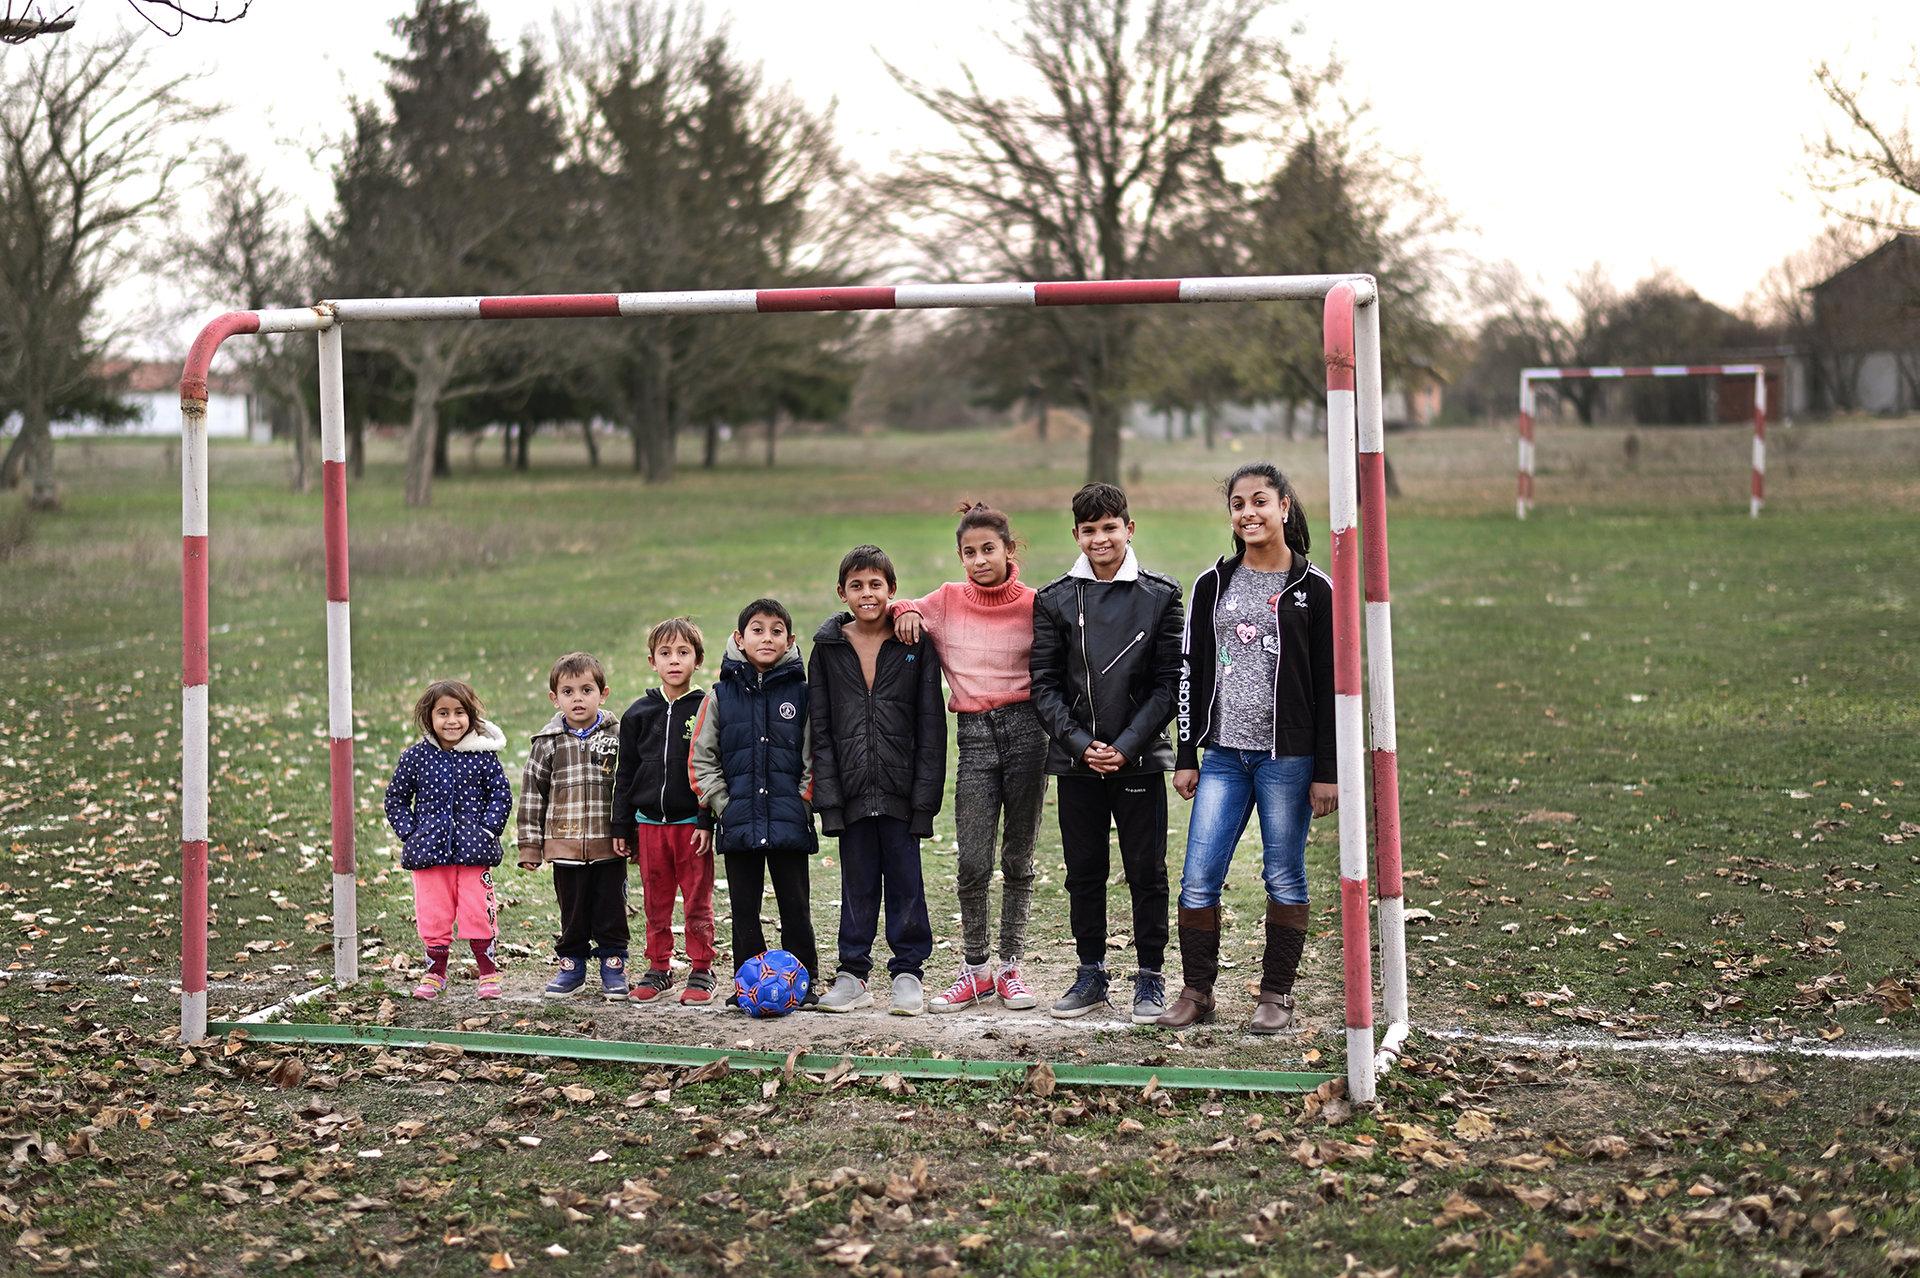 Семеен портрет на отбор от млади голобради футбалери | Author Jonko Rusev - Yonko_Rusev | PHOTO FORUM